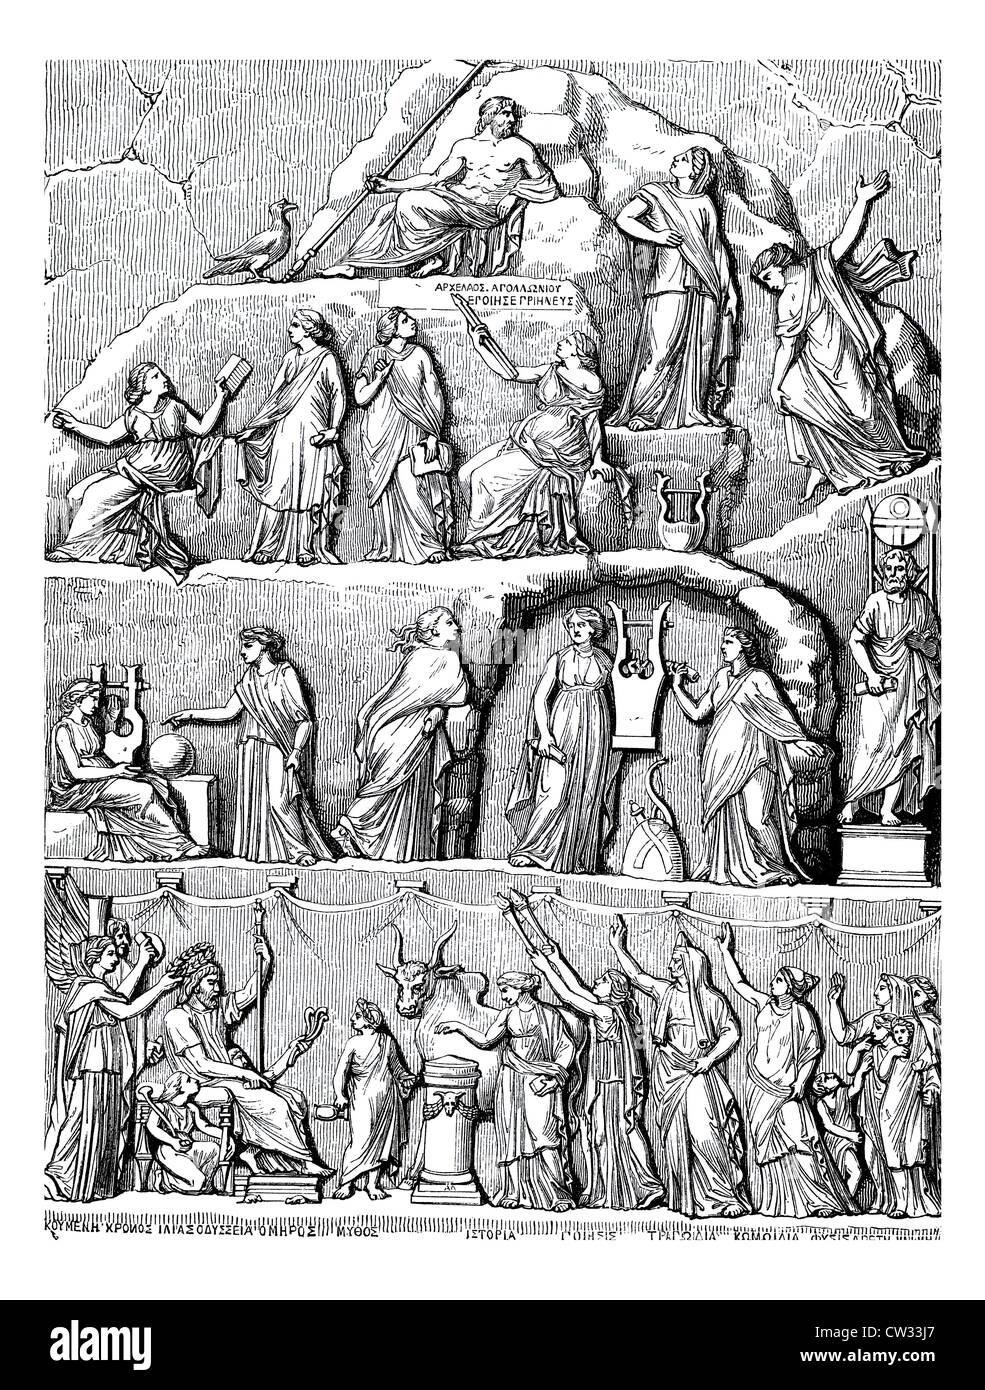 apotheosis of Homer - Stock Image